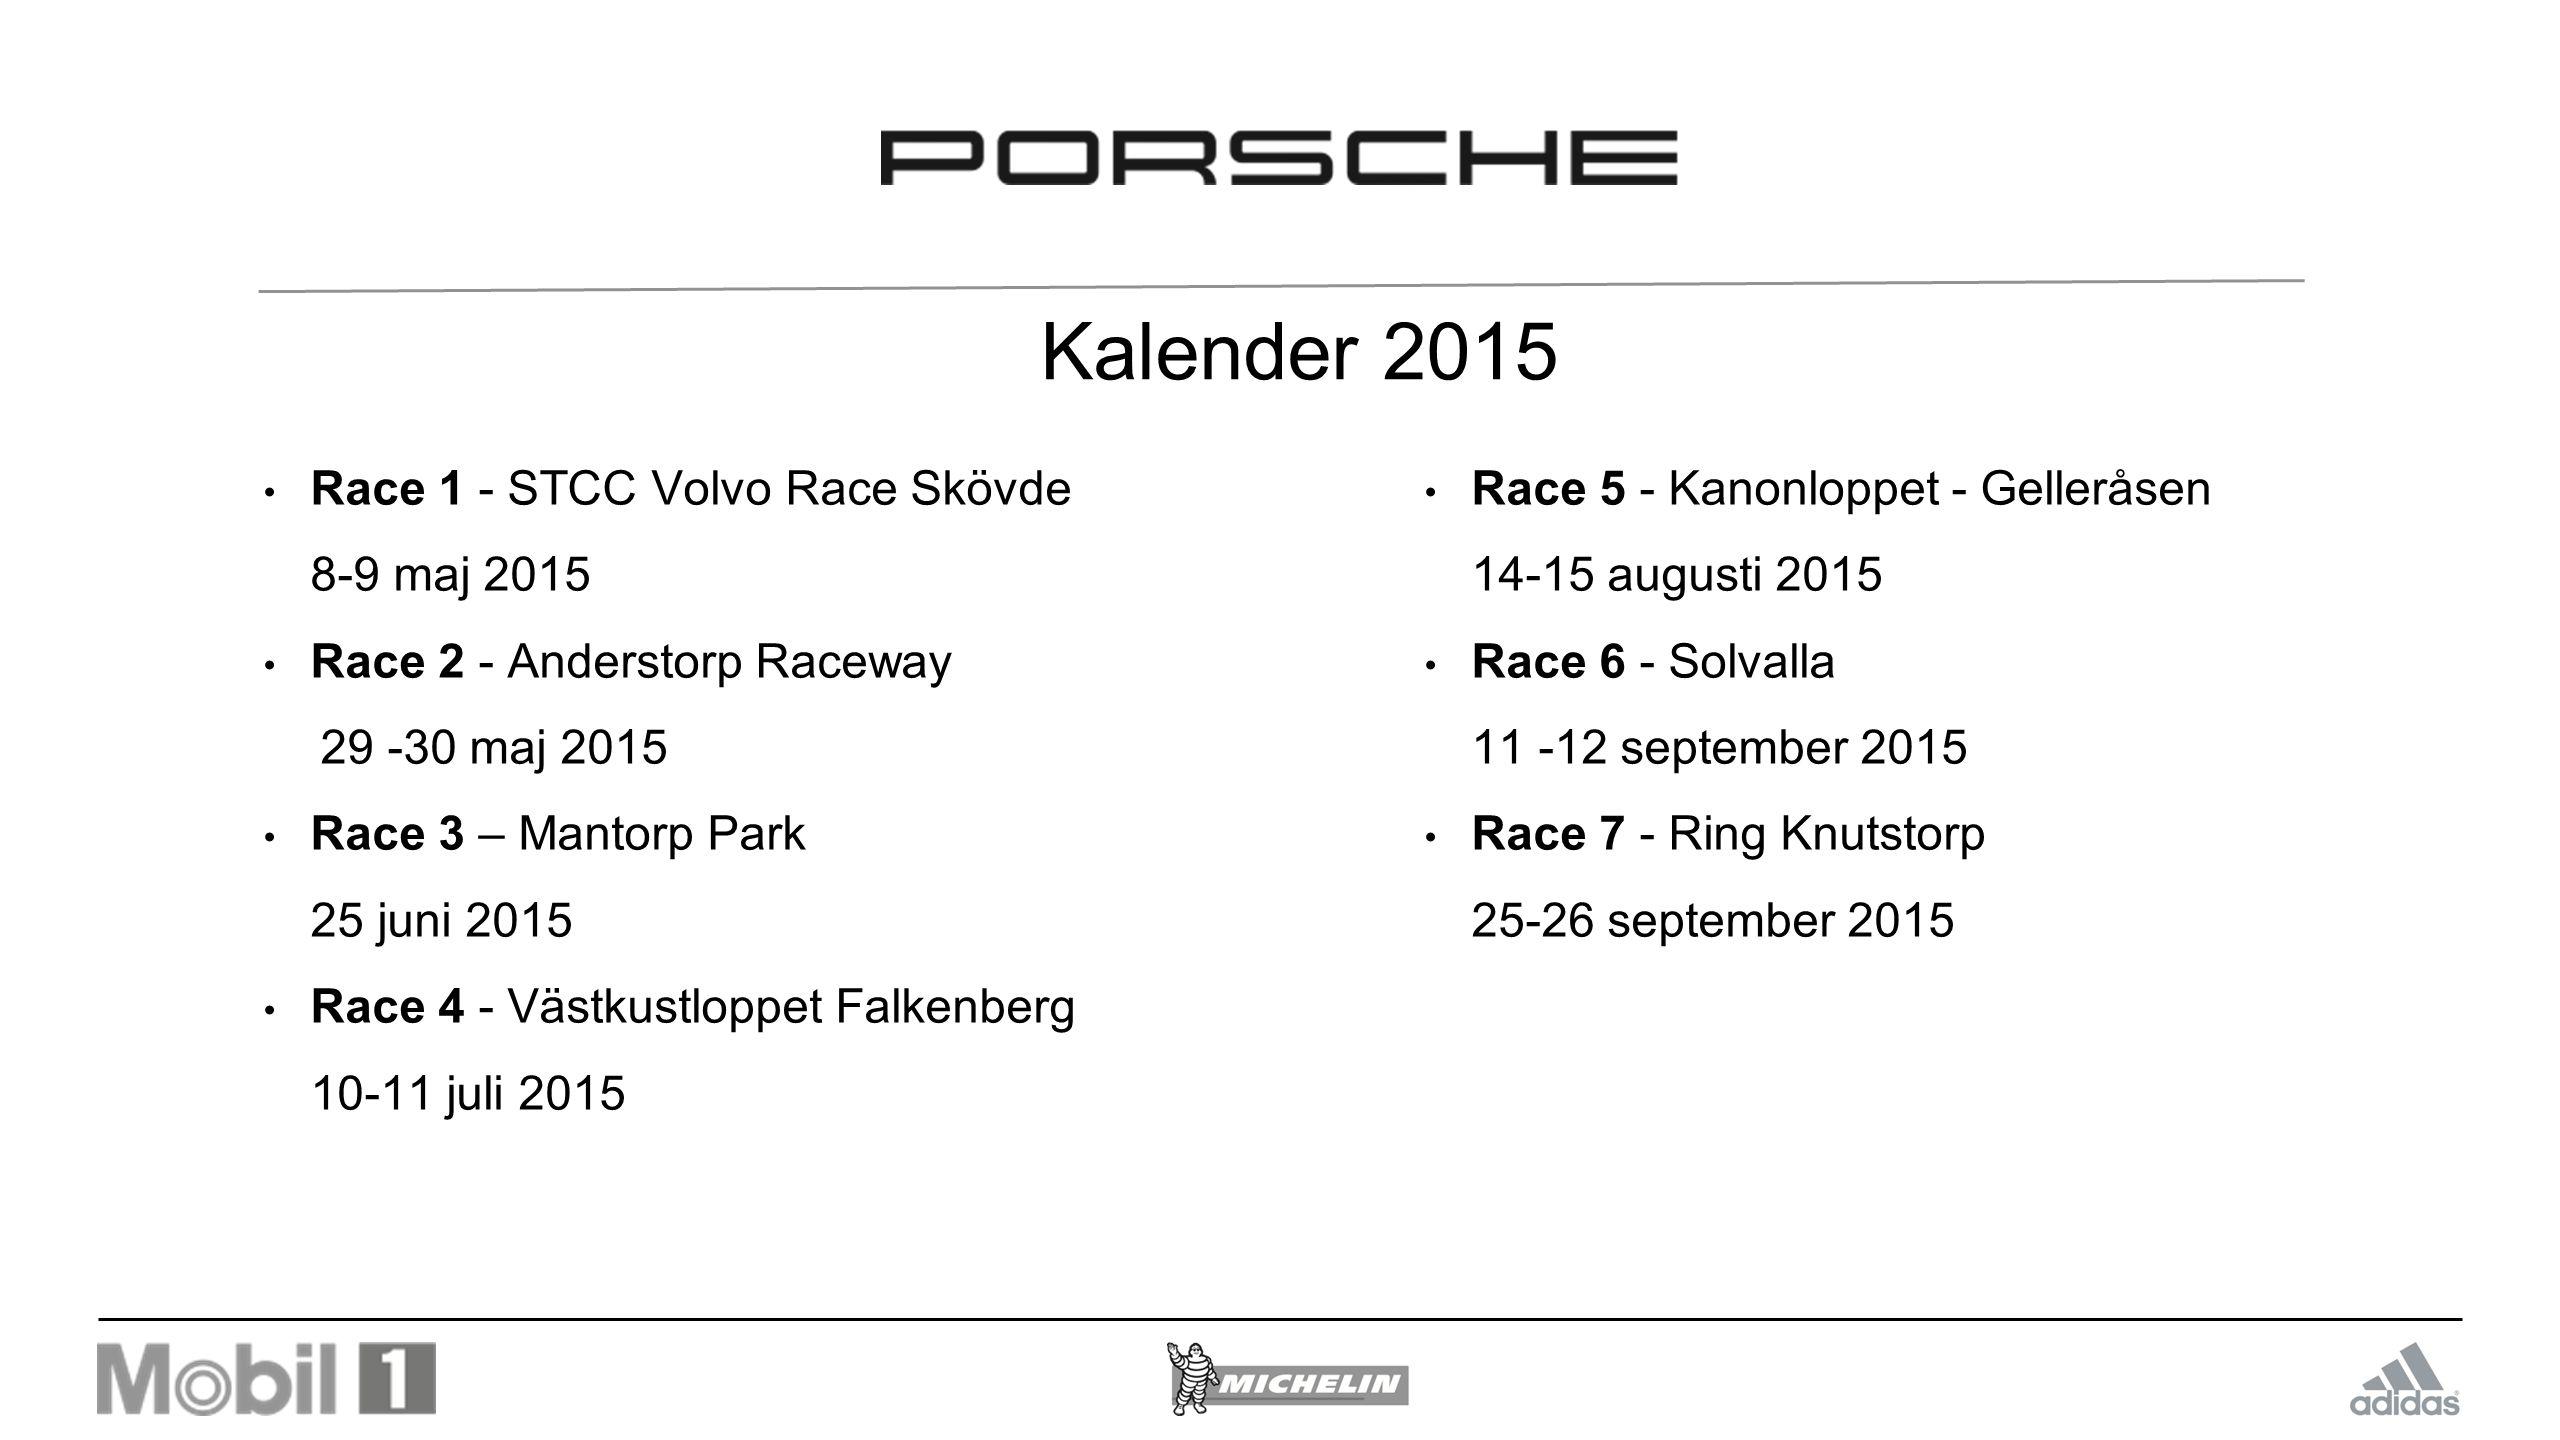 Race 1 - STCC Volvo Race Skövde 8-9 maj 2015 Race 2 - Anderstorp Raceway 29 -30 maj 2015 Race 3 – Mantorp Park 25 juni 2015 Race 4 - Västkustloppet Falkenberg 10-11 juli 2015 Race 5 - Kanonloppet - Gelleråsen 14-15 augusti 2015 Race 6 - Solvalla 11 -12 september 2015 Race 7 - Ring Knutstorp 25-26 september 2015 Kalender 2015